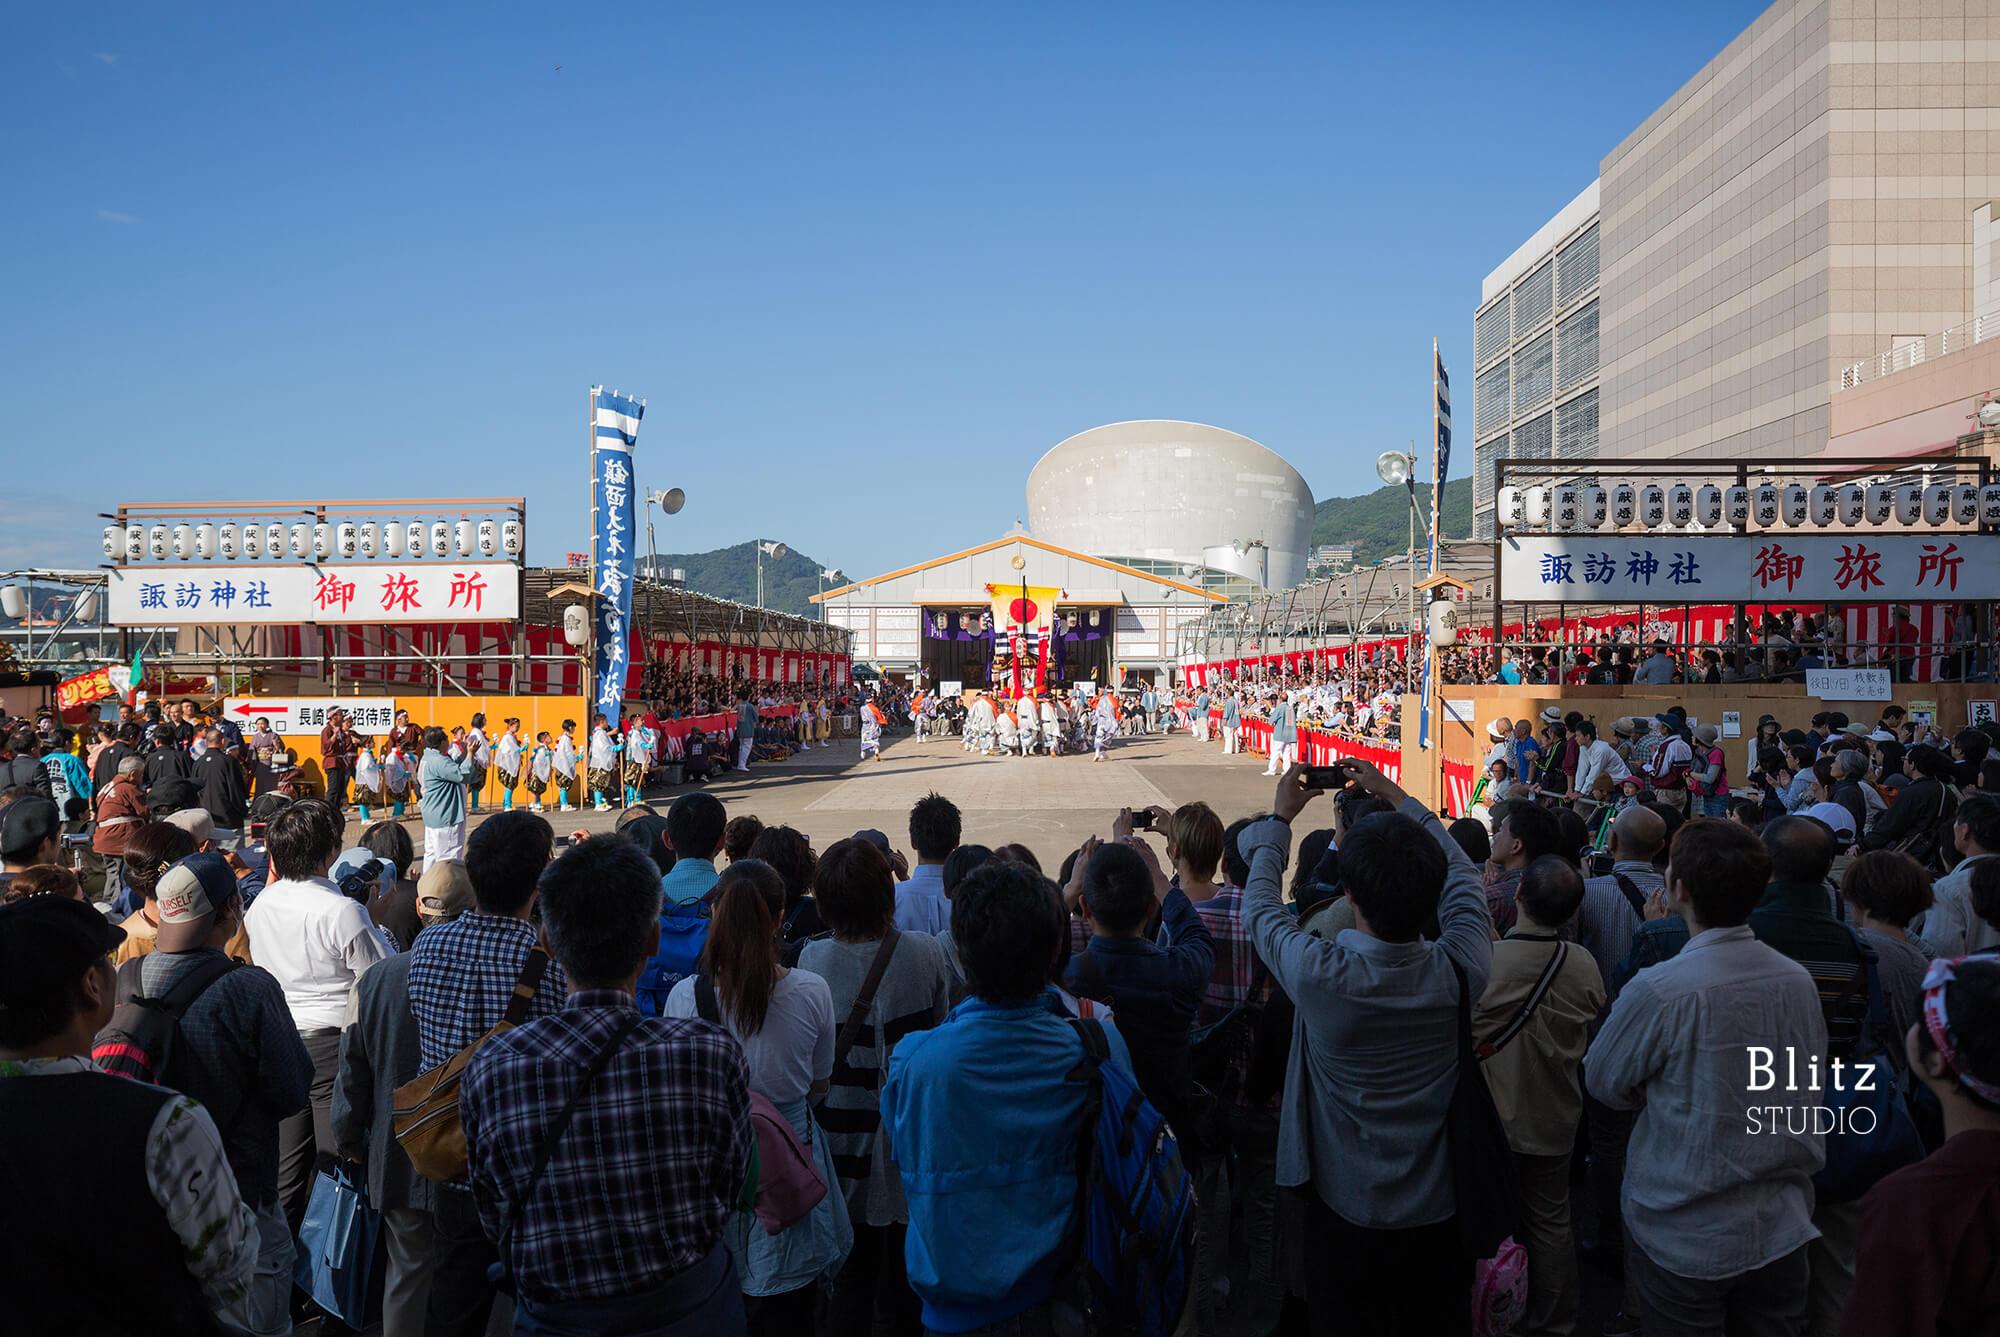 『諏訪神社 お旅所』-長崎県長崎市-建築写真・竣工写真・インテリア写真2